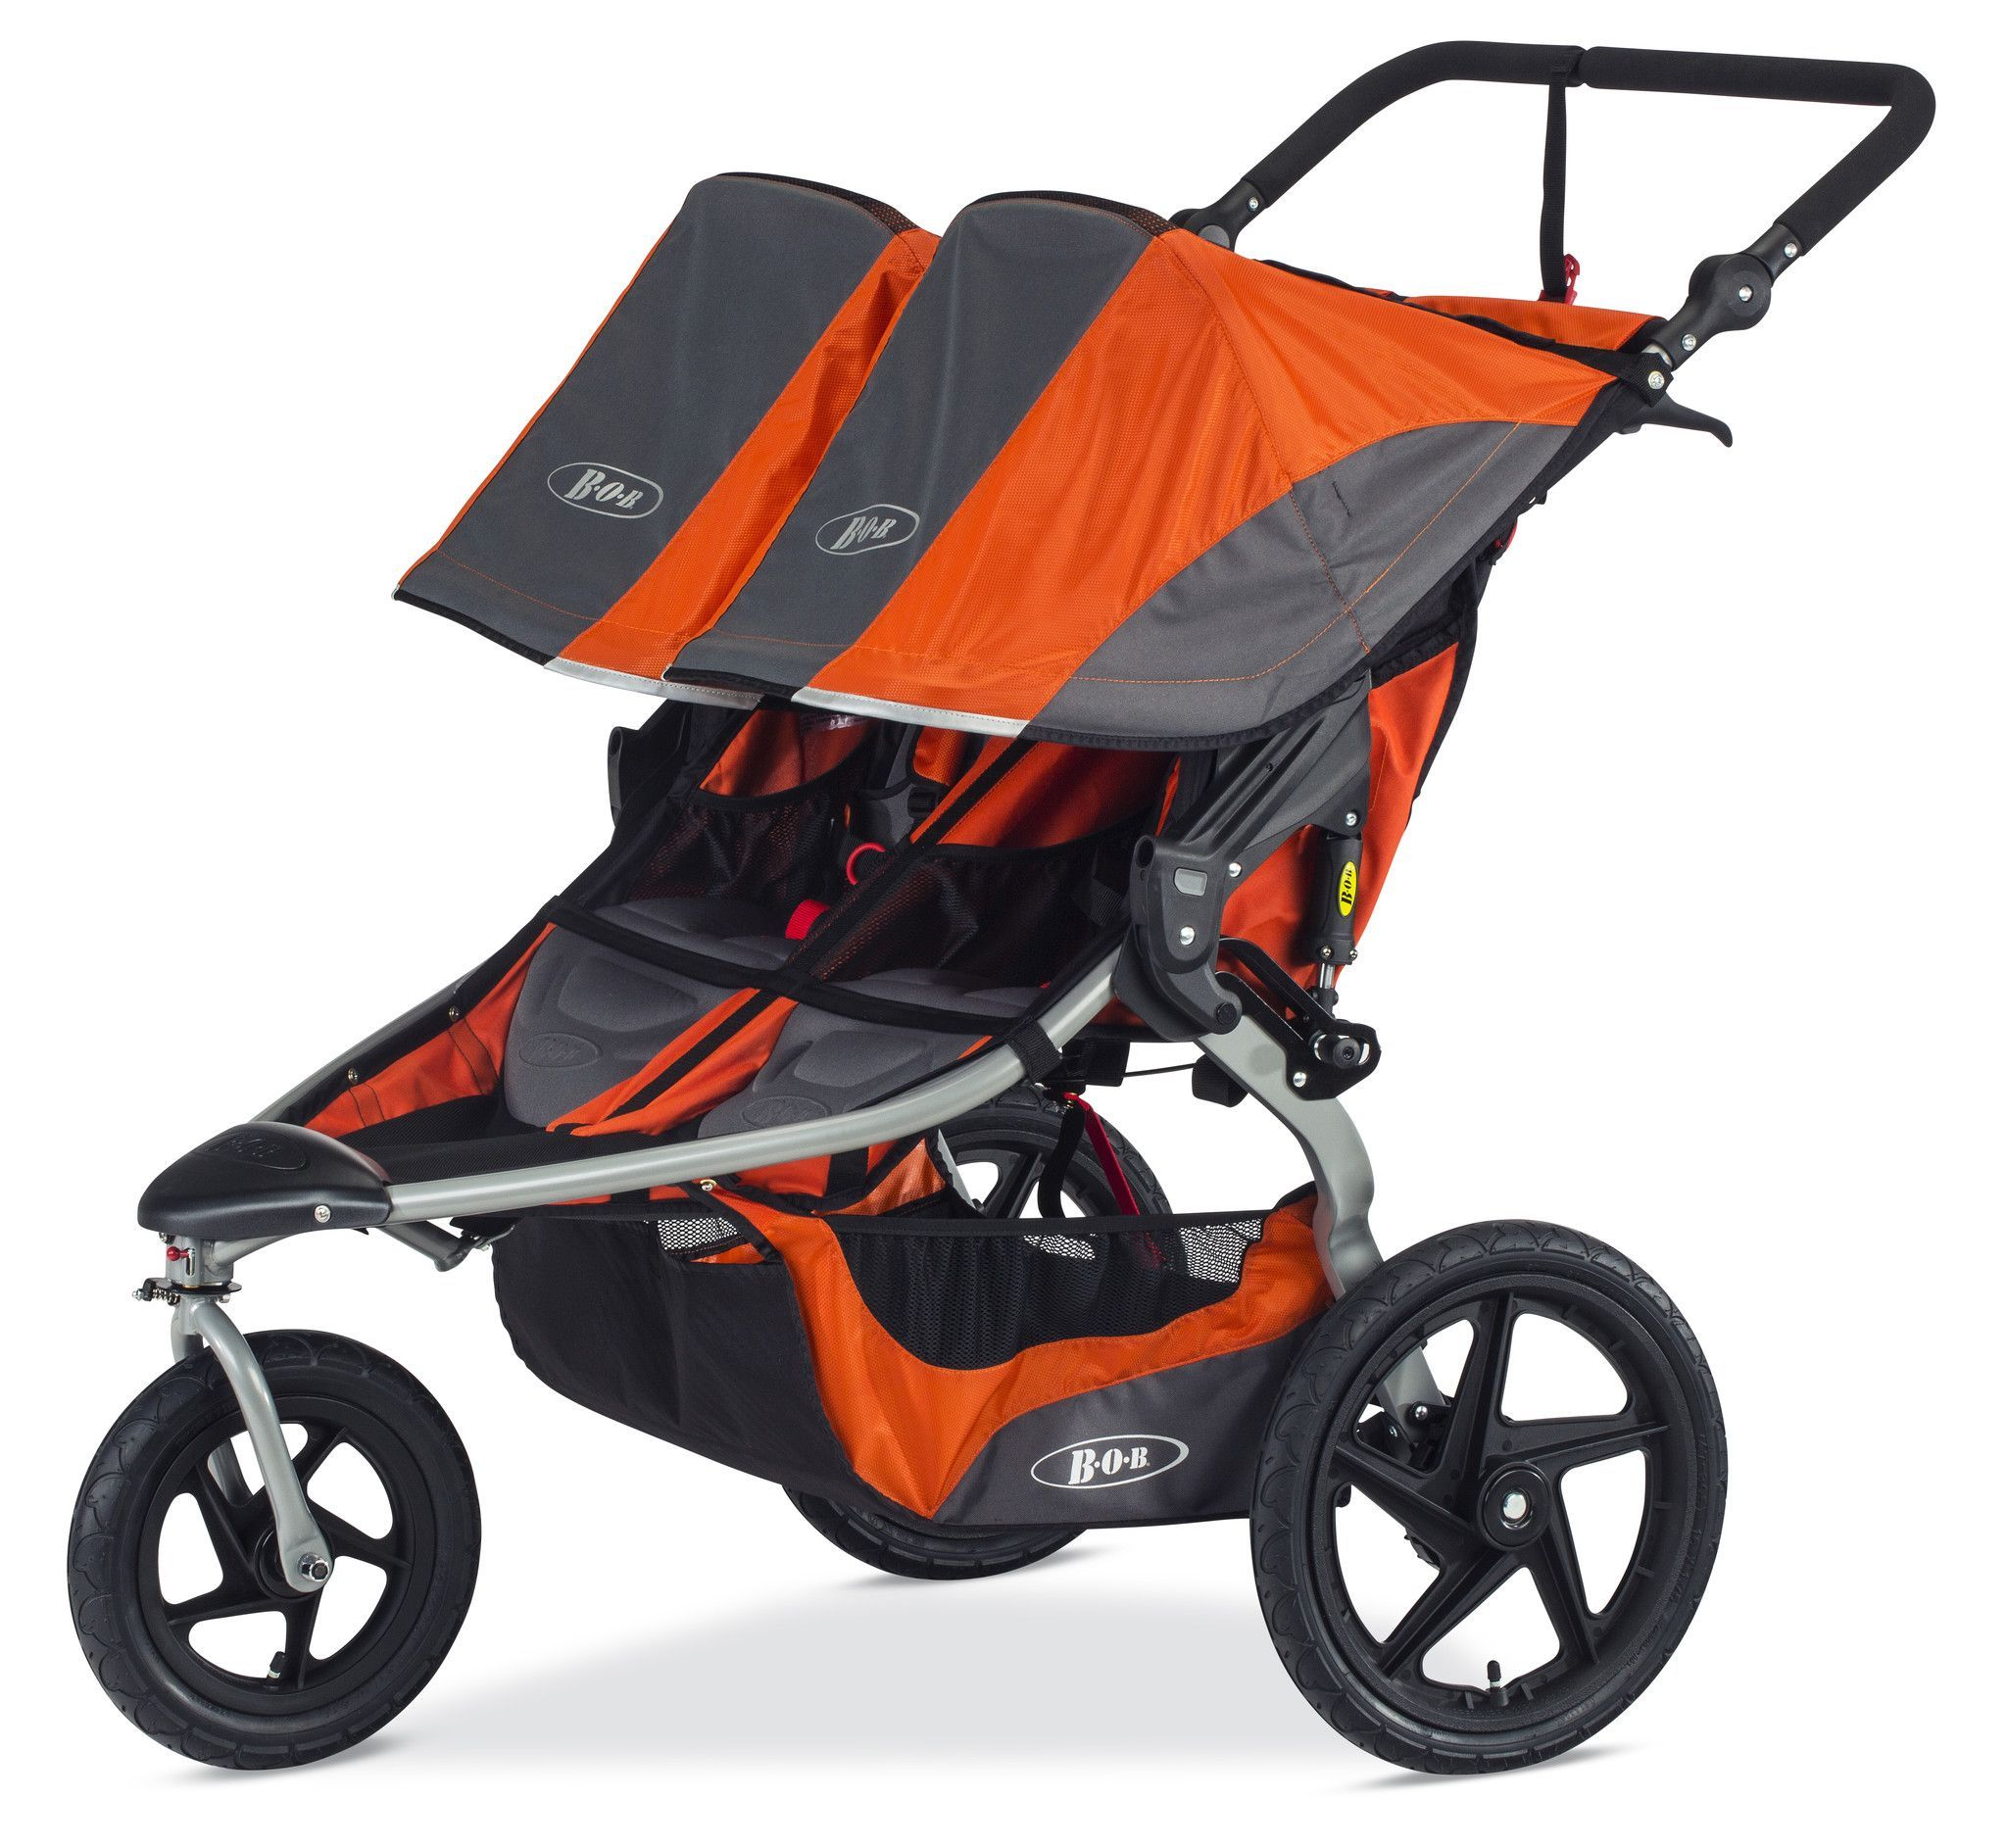 Revolution Flex 3.0 Duallie Stroller Parking, The ordinary